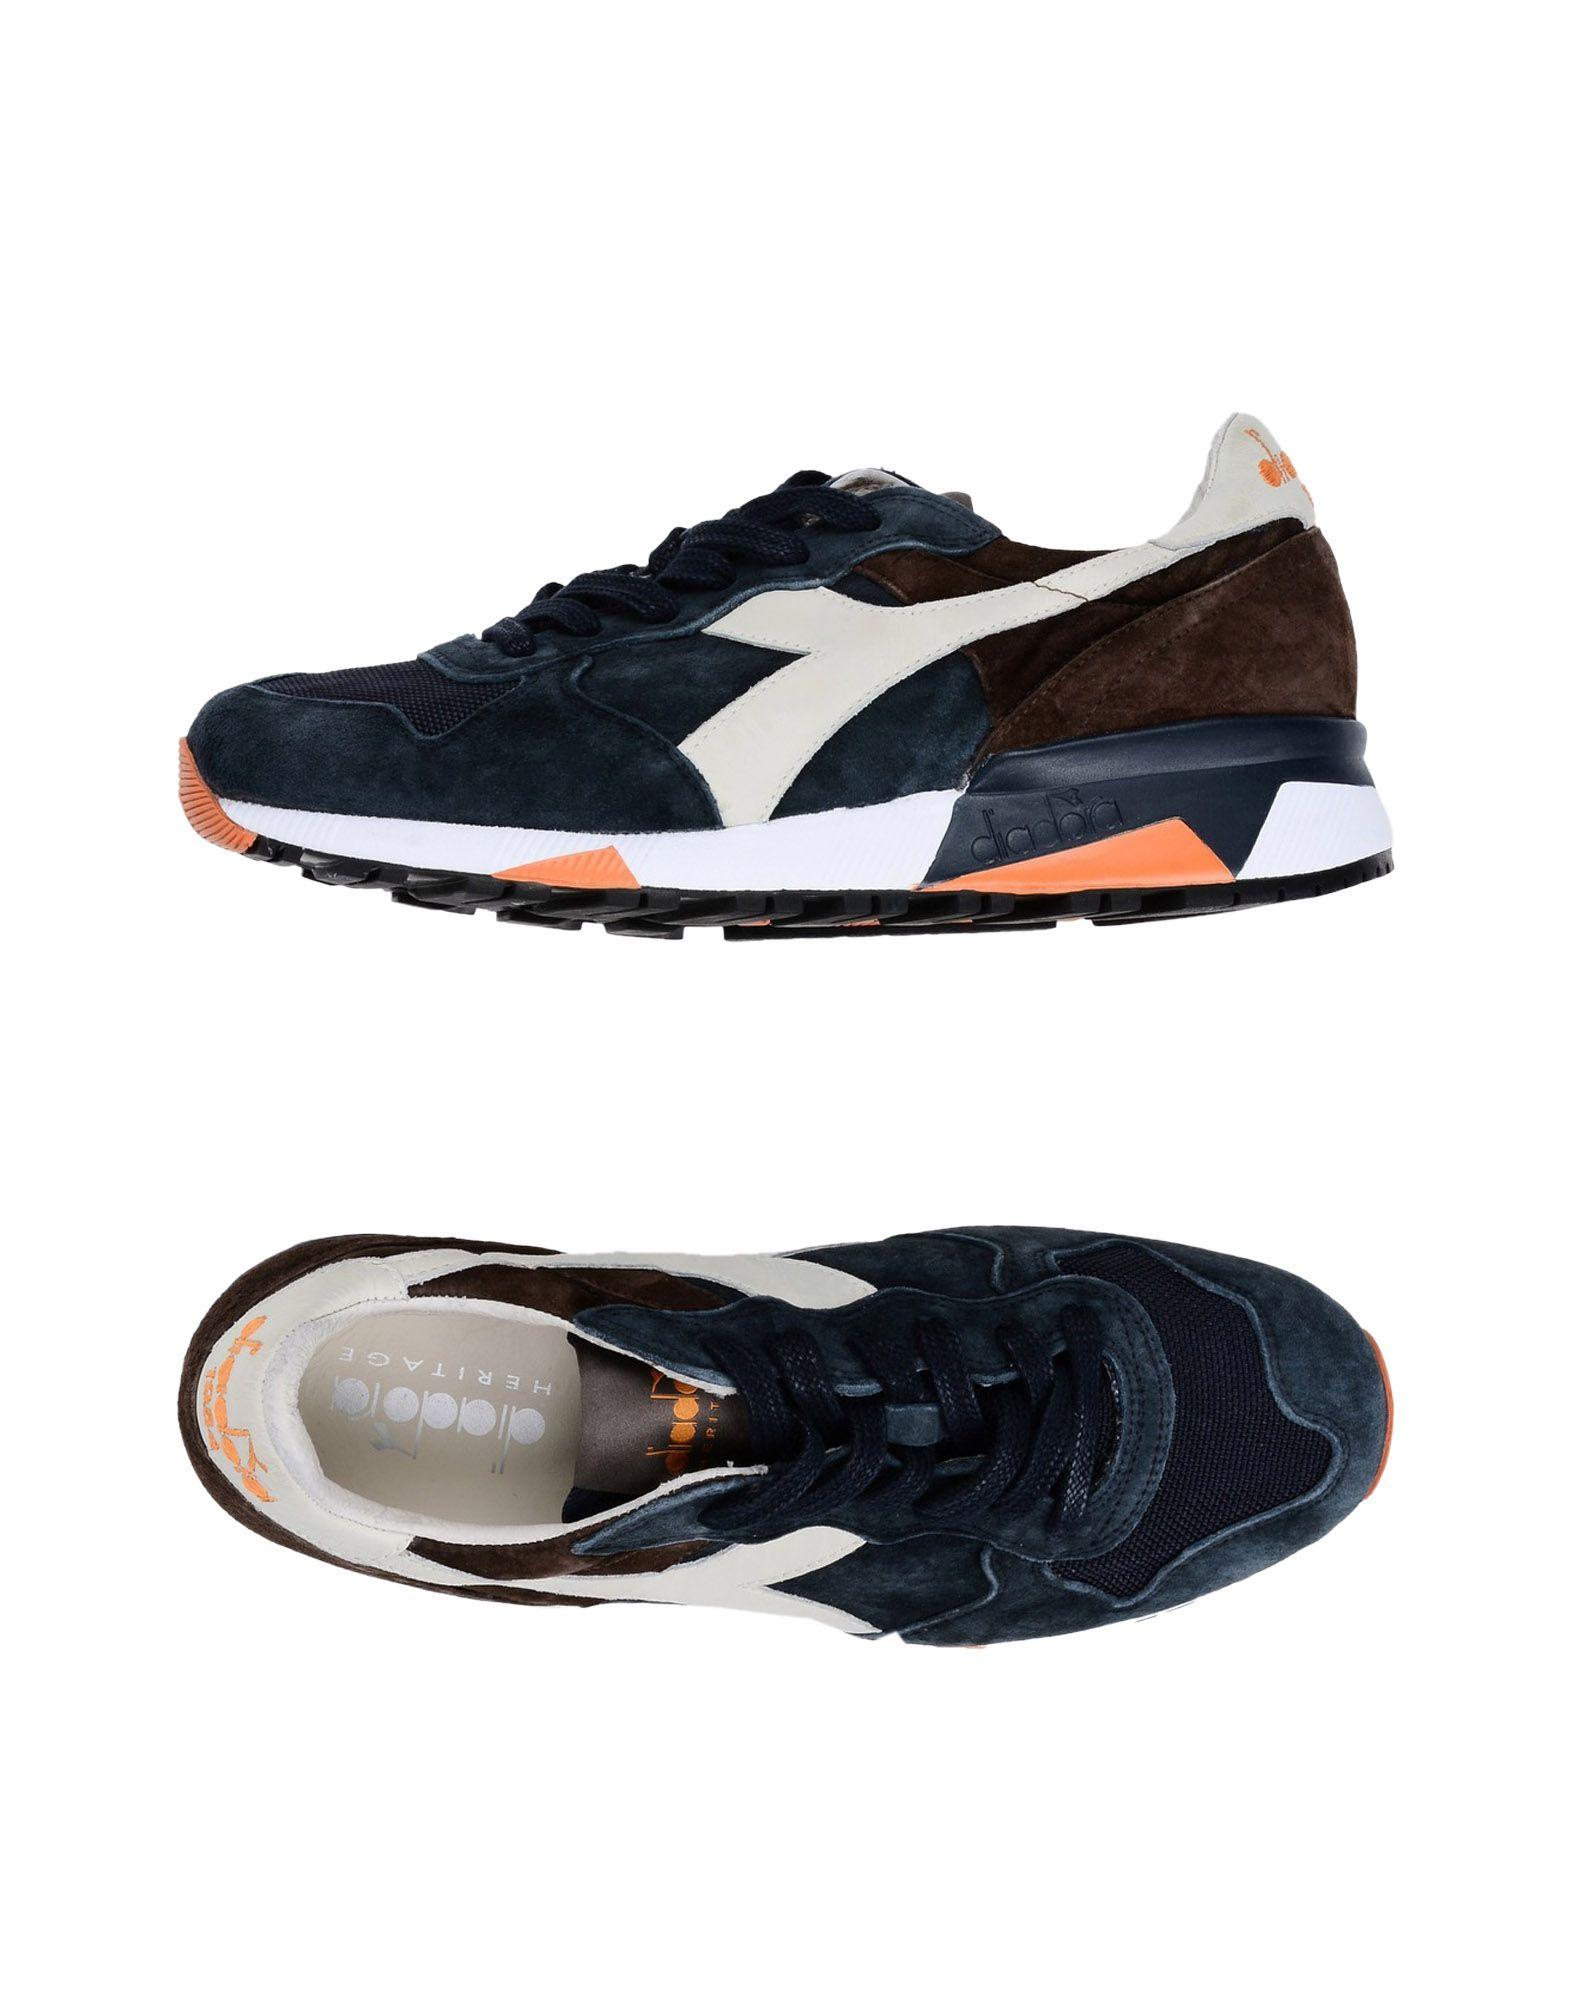 Sneakers Diadora Heritage Trident 90 S - Uomo - Acquista online su